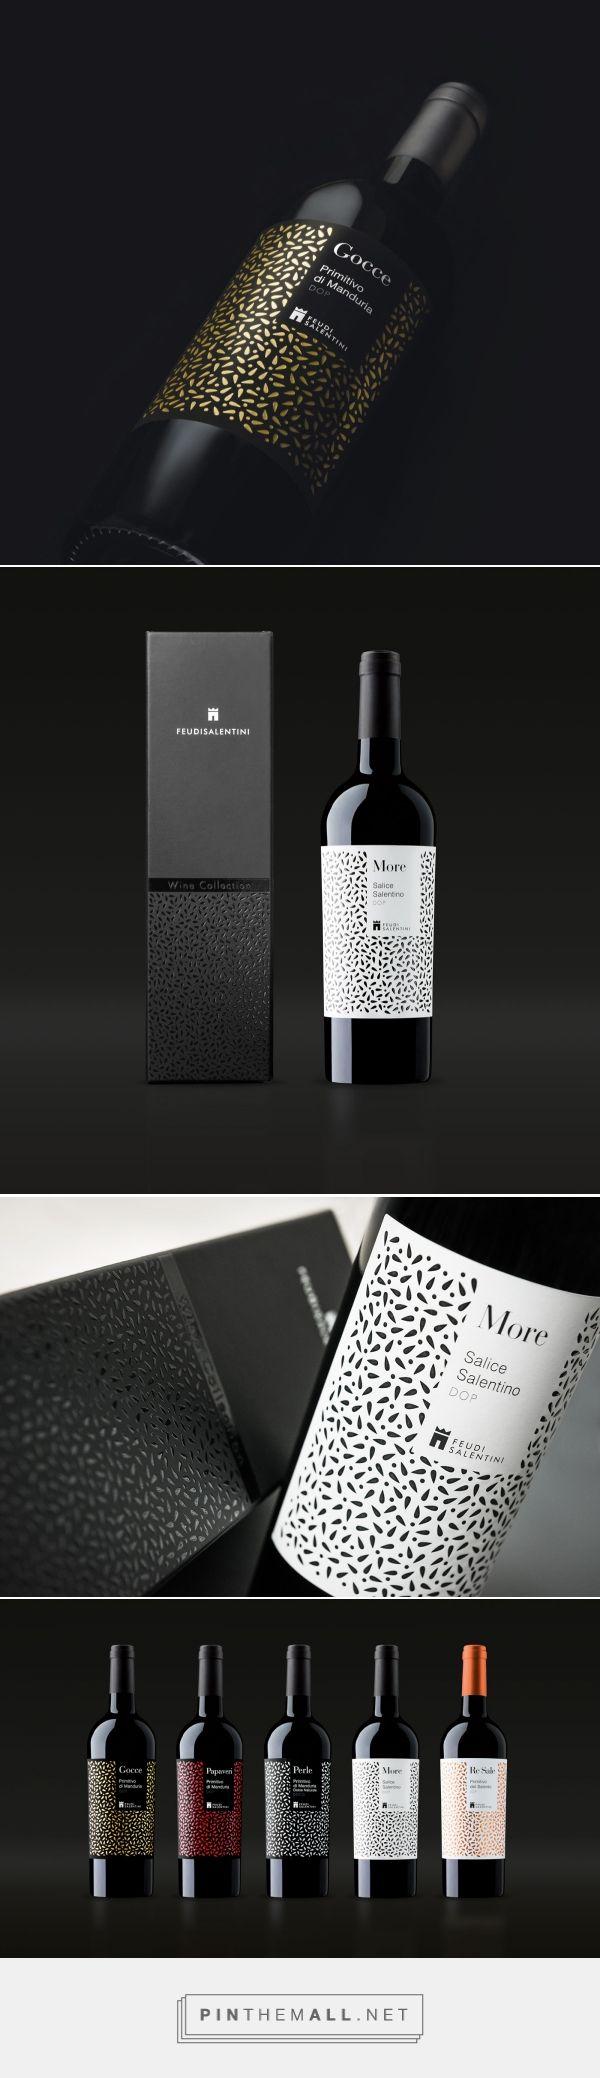 Etichette e packaging vini Feudi Salentini... - a grouped images picture - Pin Them All